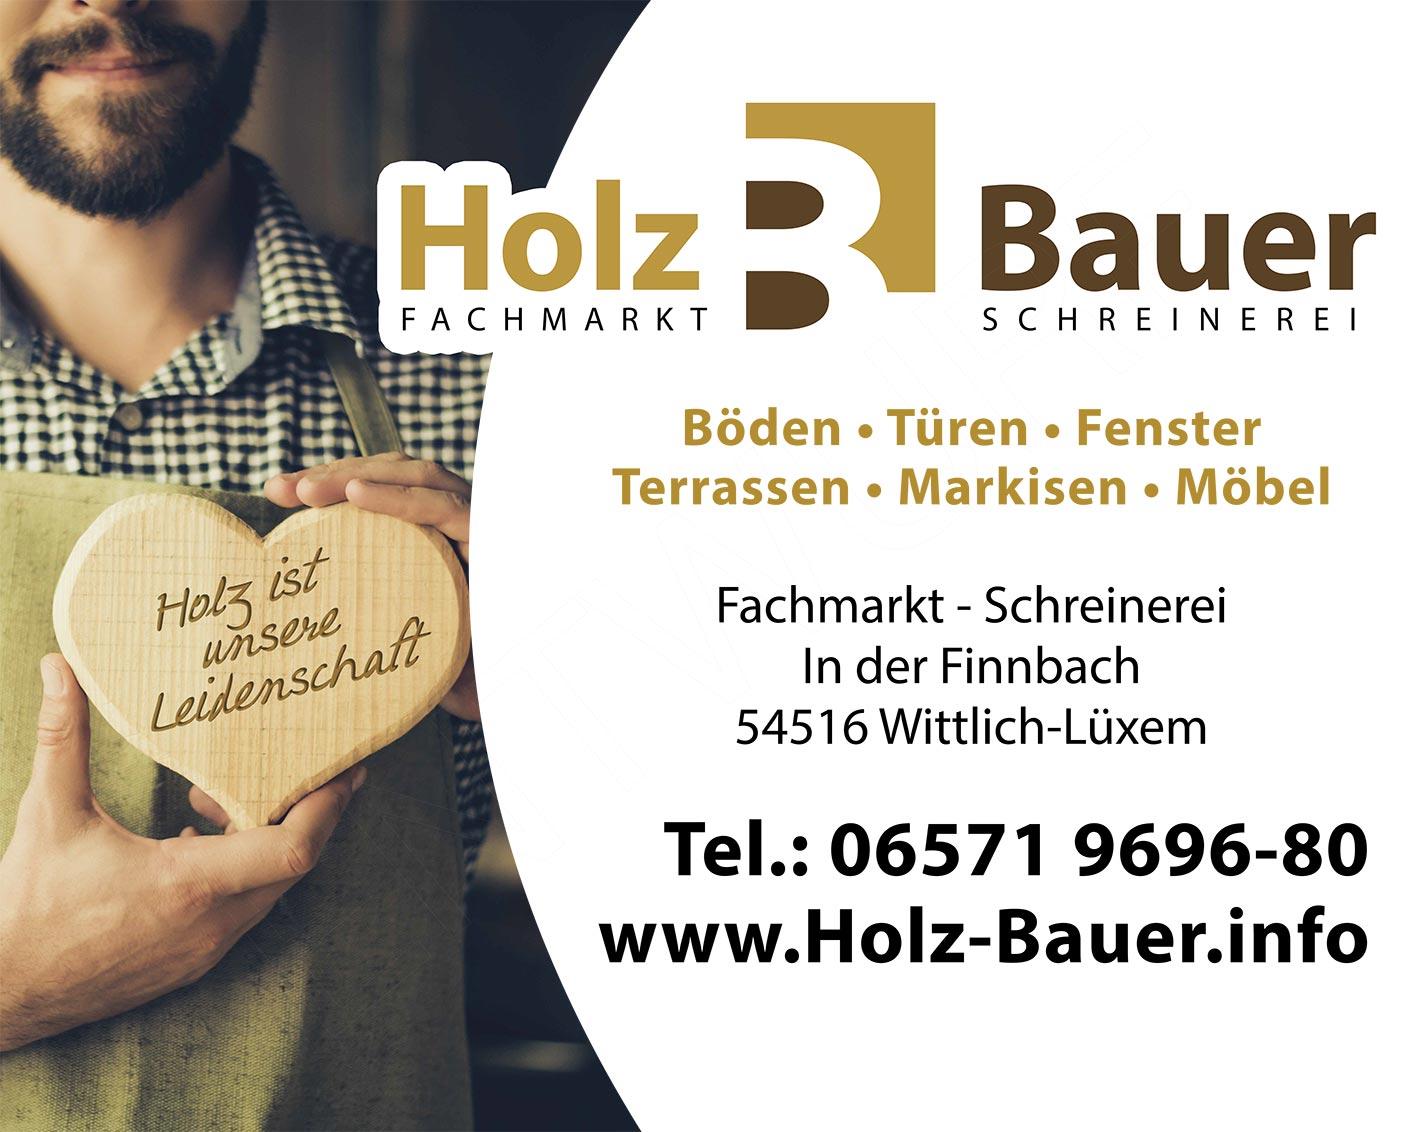 Holz Bauer GbR